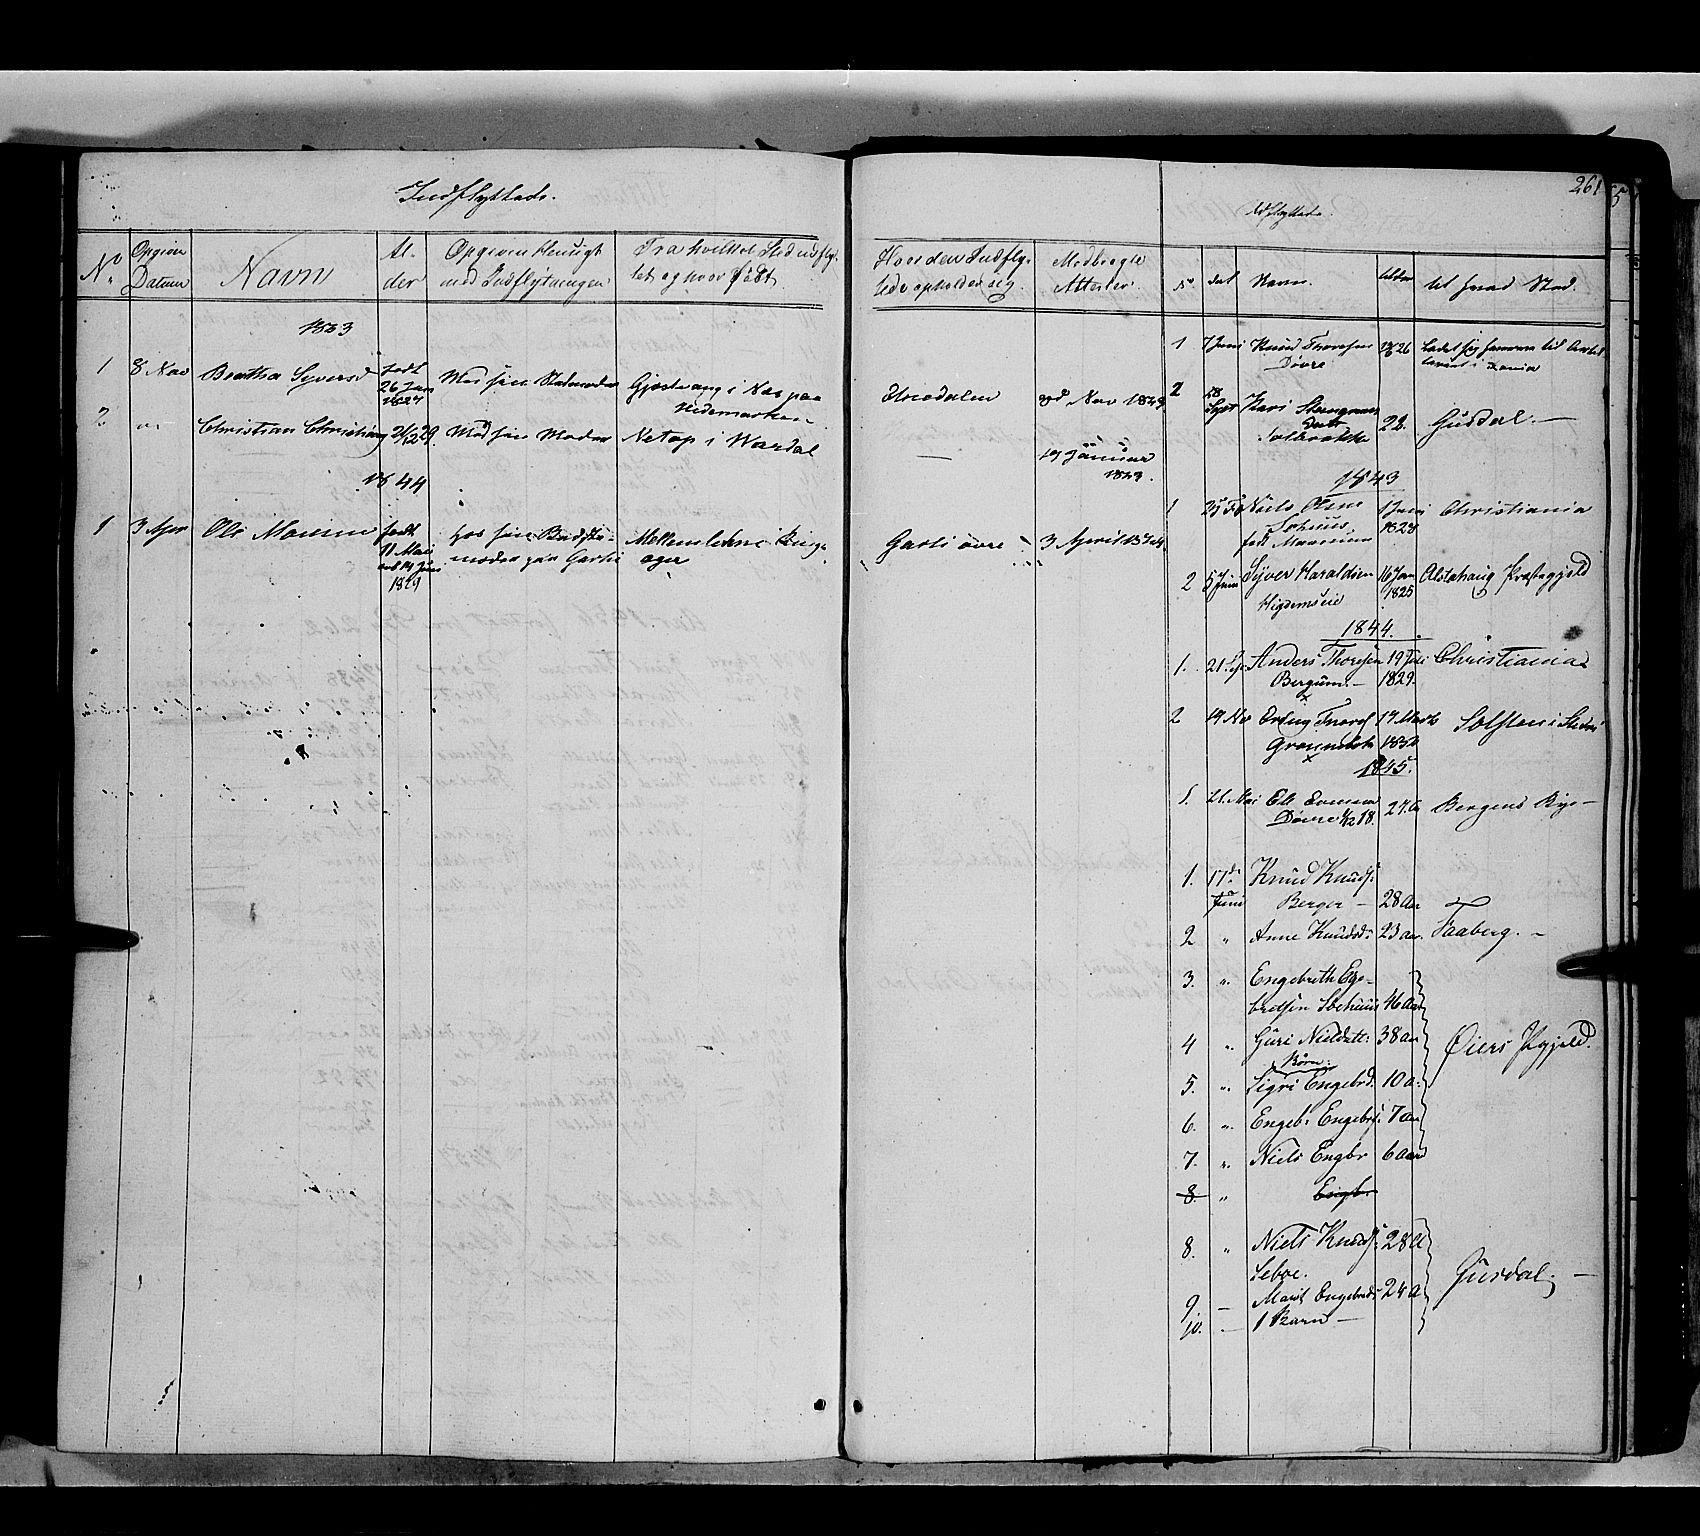 SAH, Nord-Aurdal prestekontor, Ministerialbok nr. 7, 1842-1863, s. 261